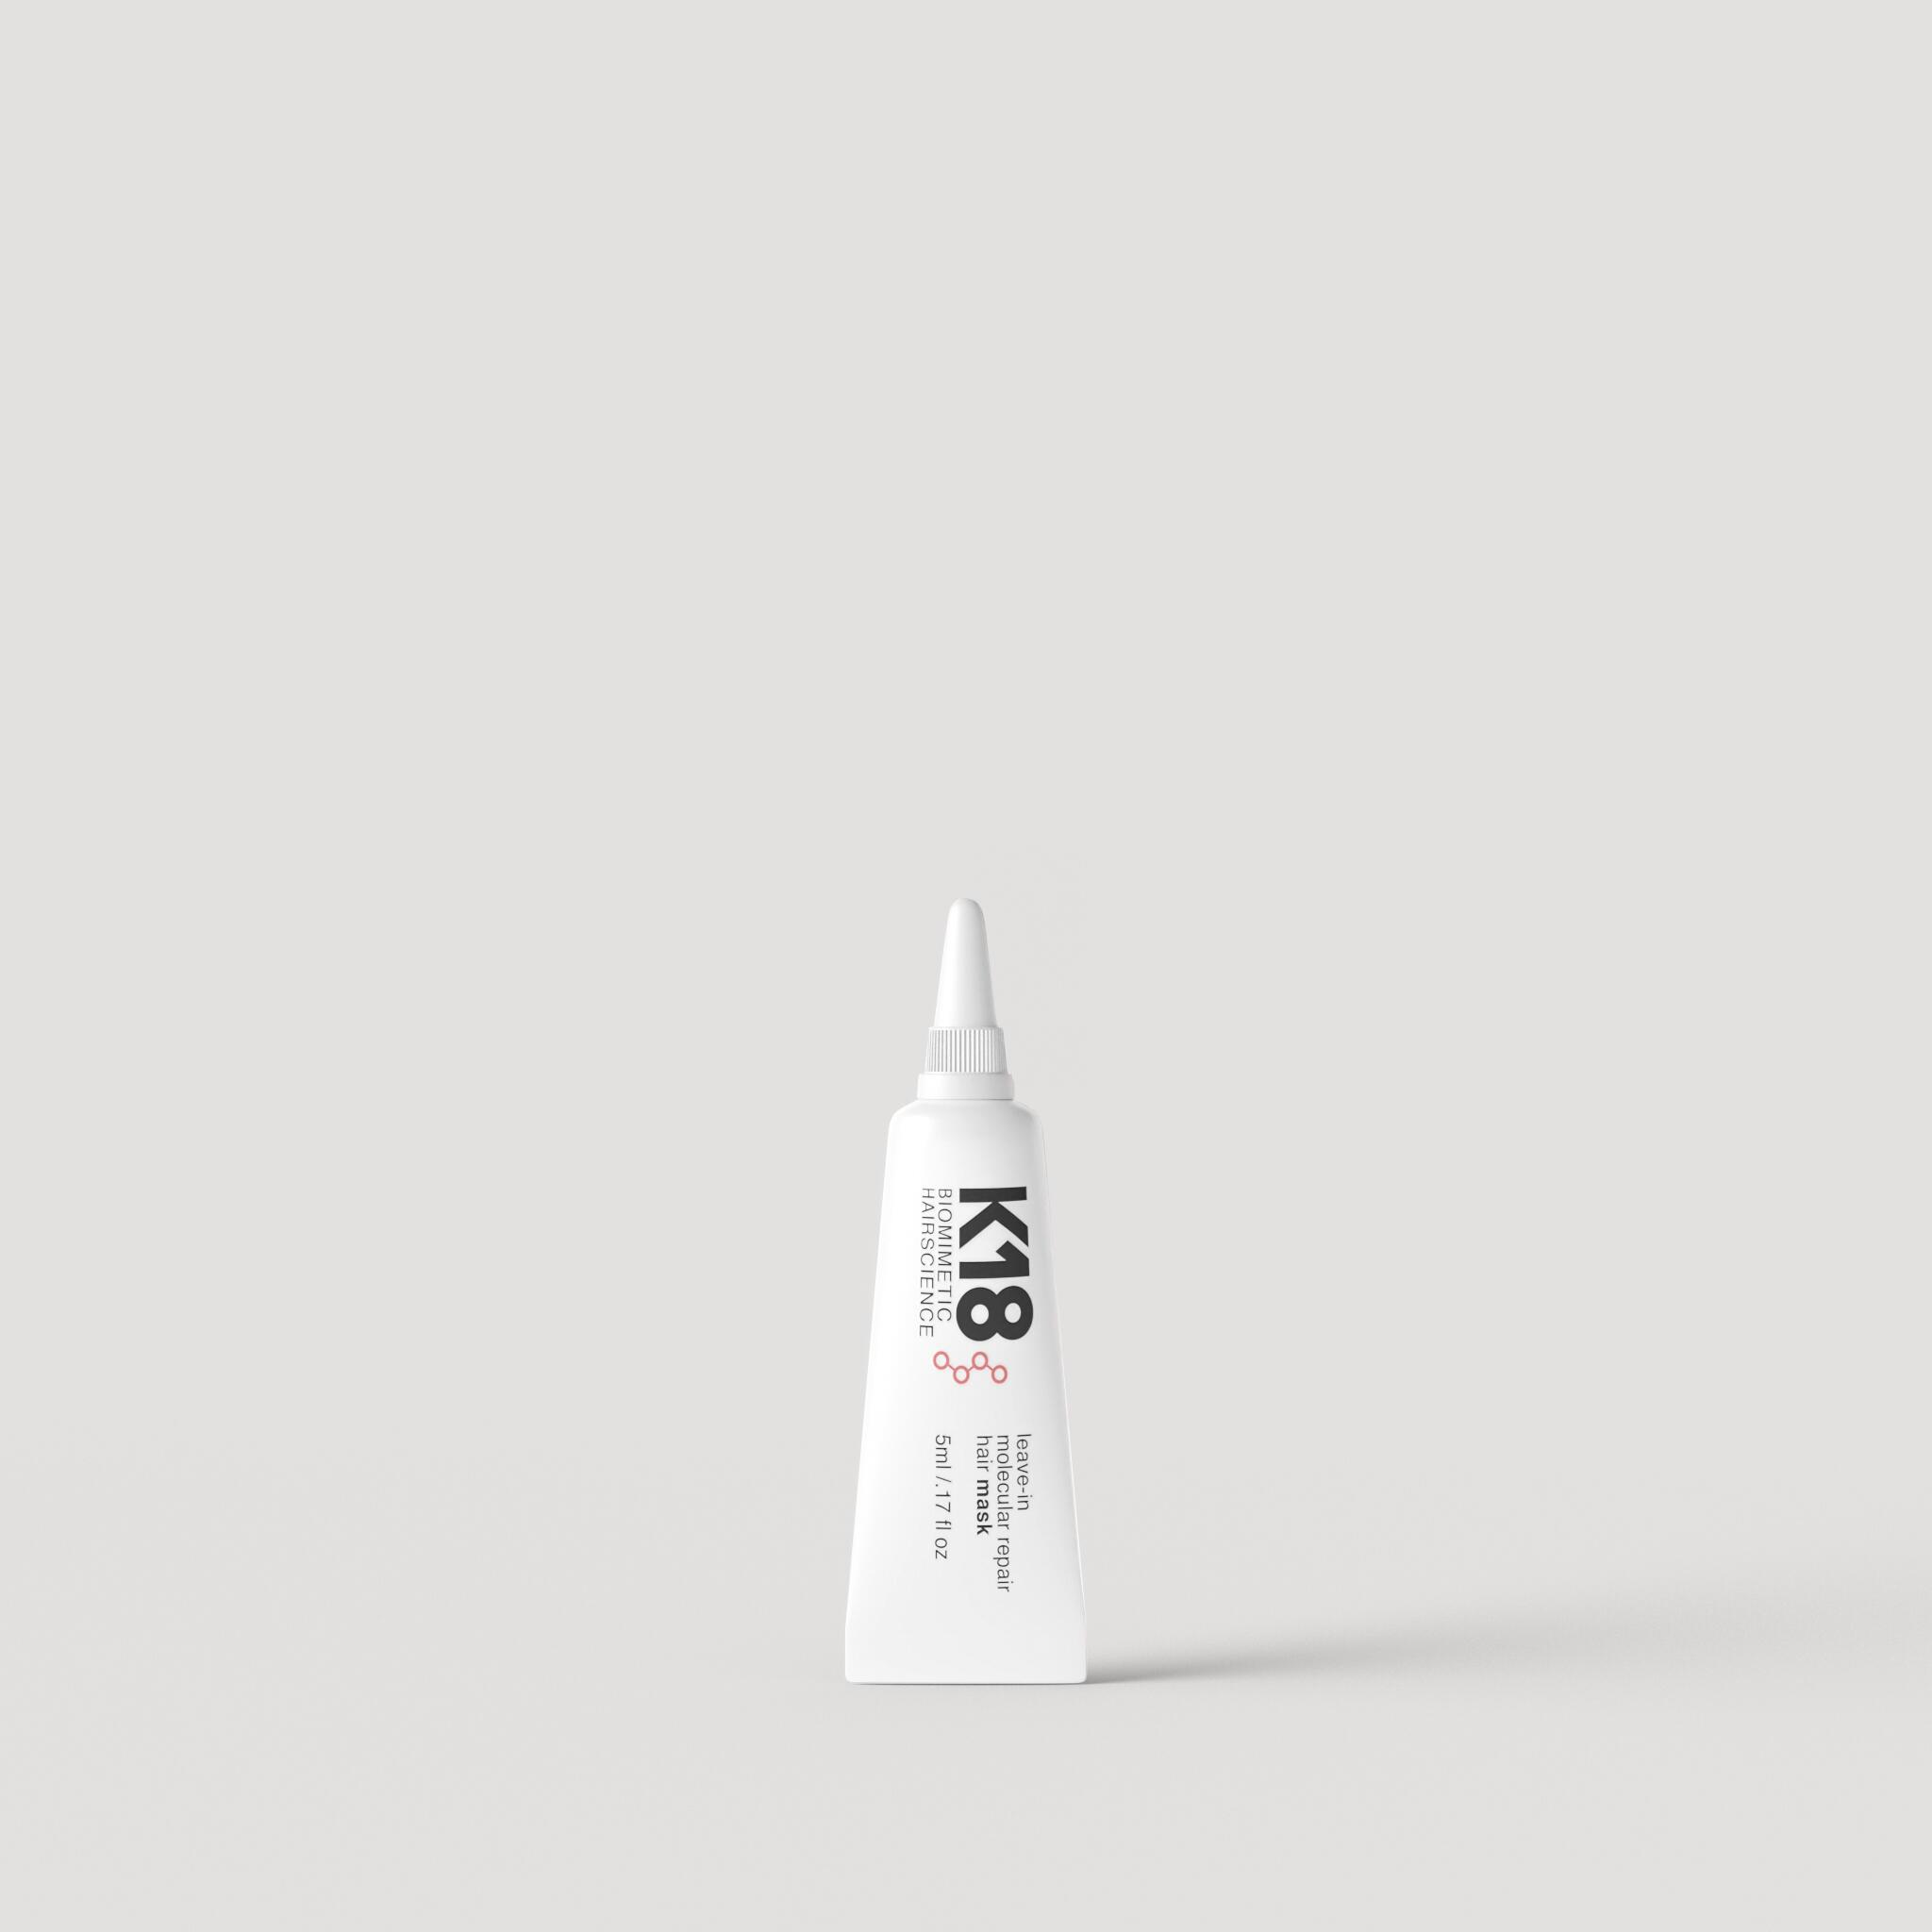 K18 Leave In Molecular Repair Mask 5ml null